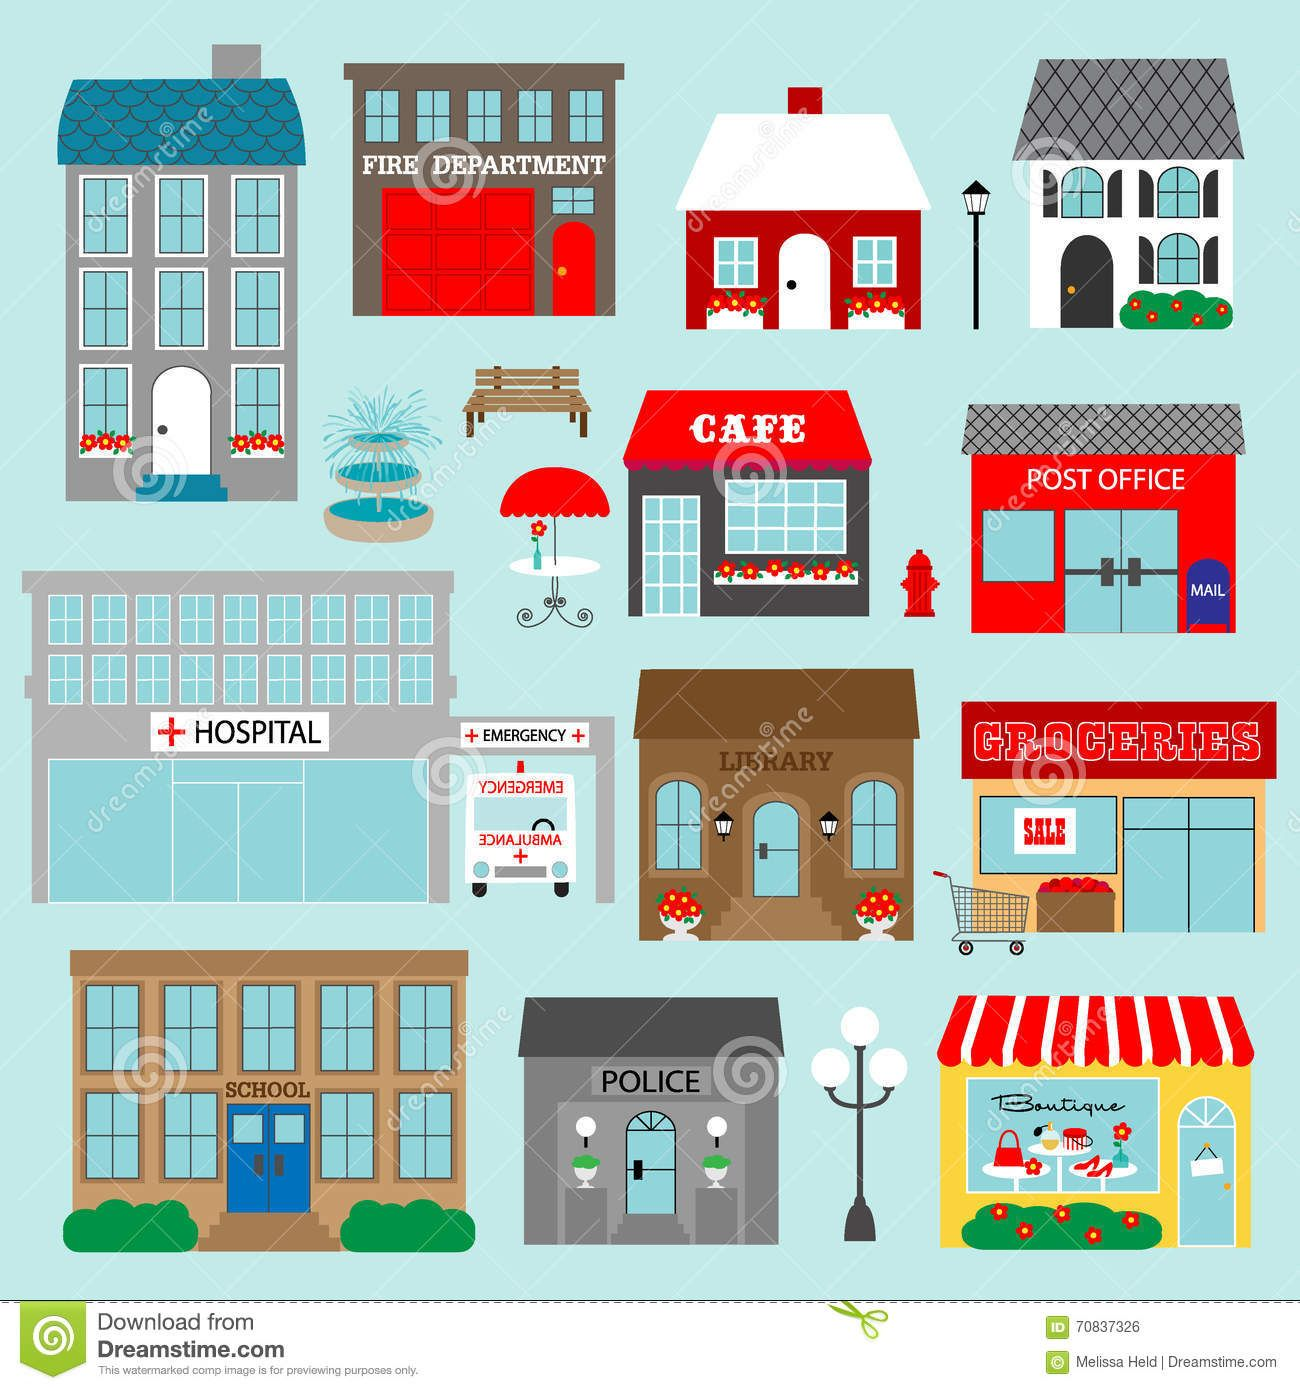 Town Buildings Clipart Stock Illustration Illustration Of Light 70837326 Town Building Building Illustration Clip Art